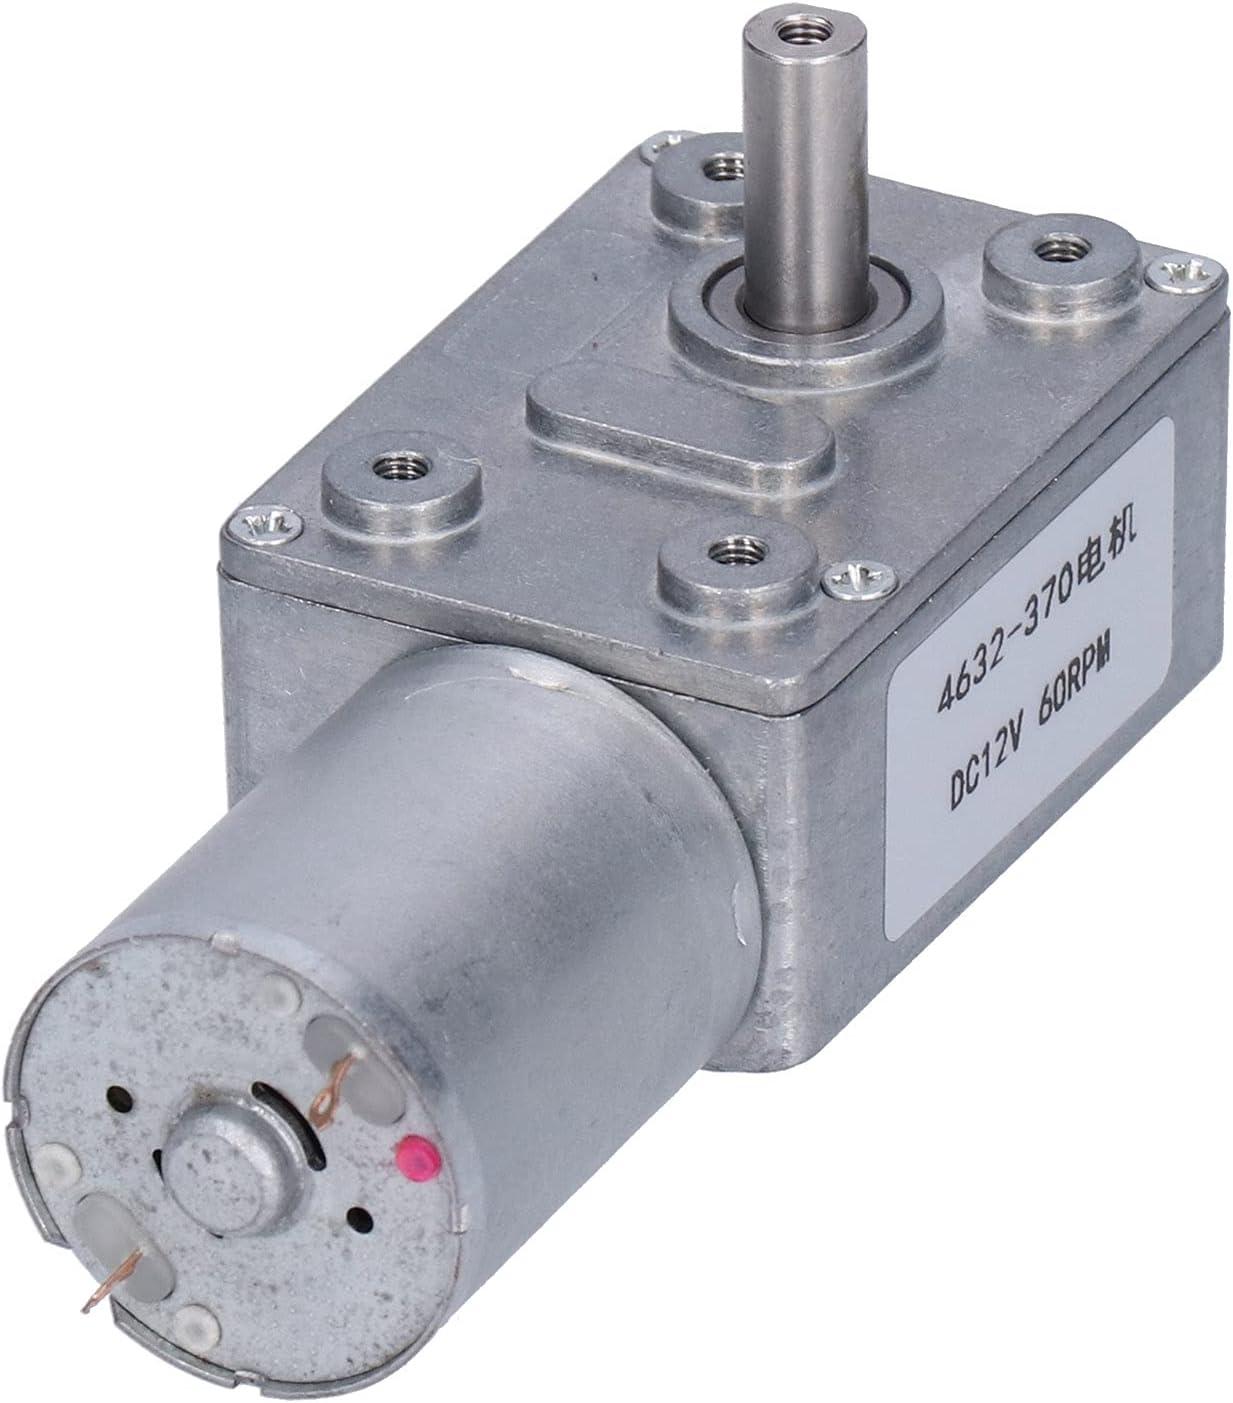 Turbine Long-awaited Gear Box Self‑Locking 60RPM 12V Houston Mall Geared Reducing DC